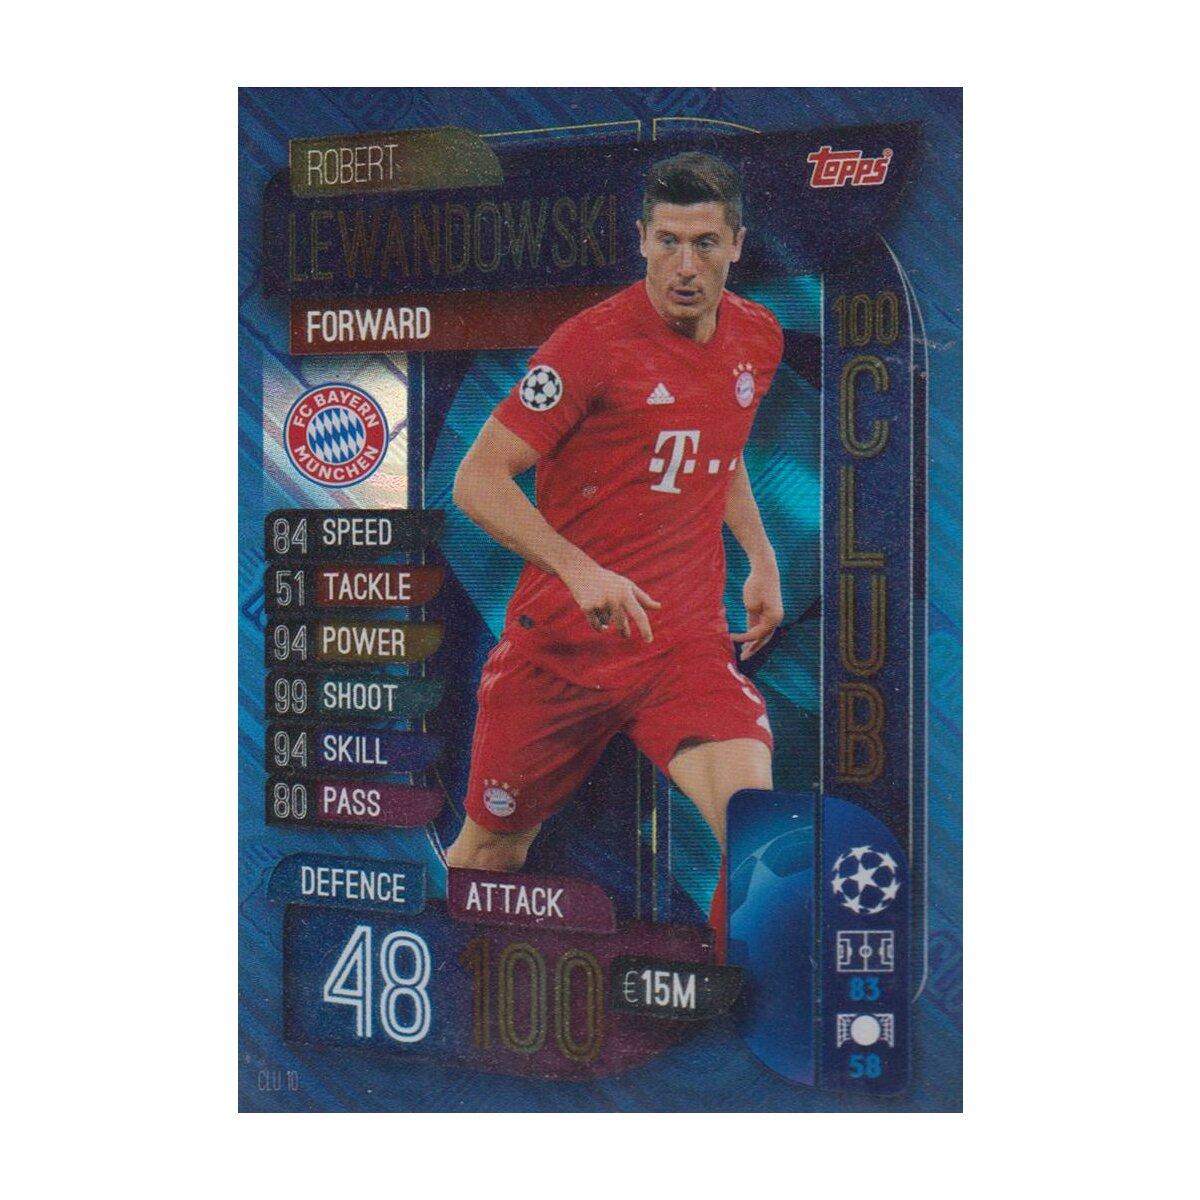 Champions League extra 19//20 2019 2020-clu10-Robert Lewandowski-club 100